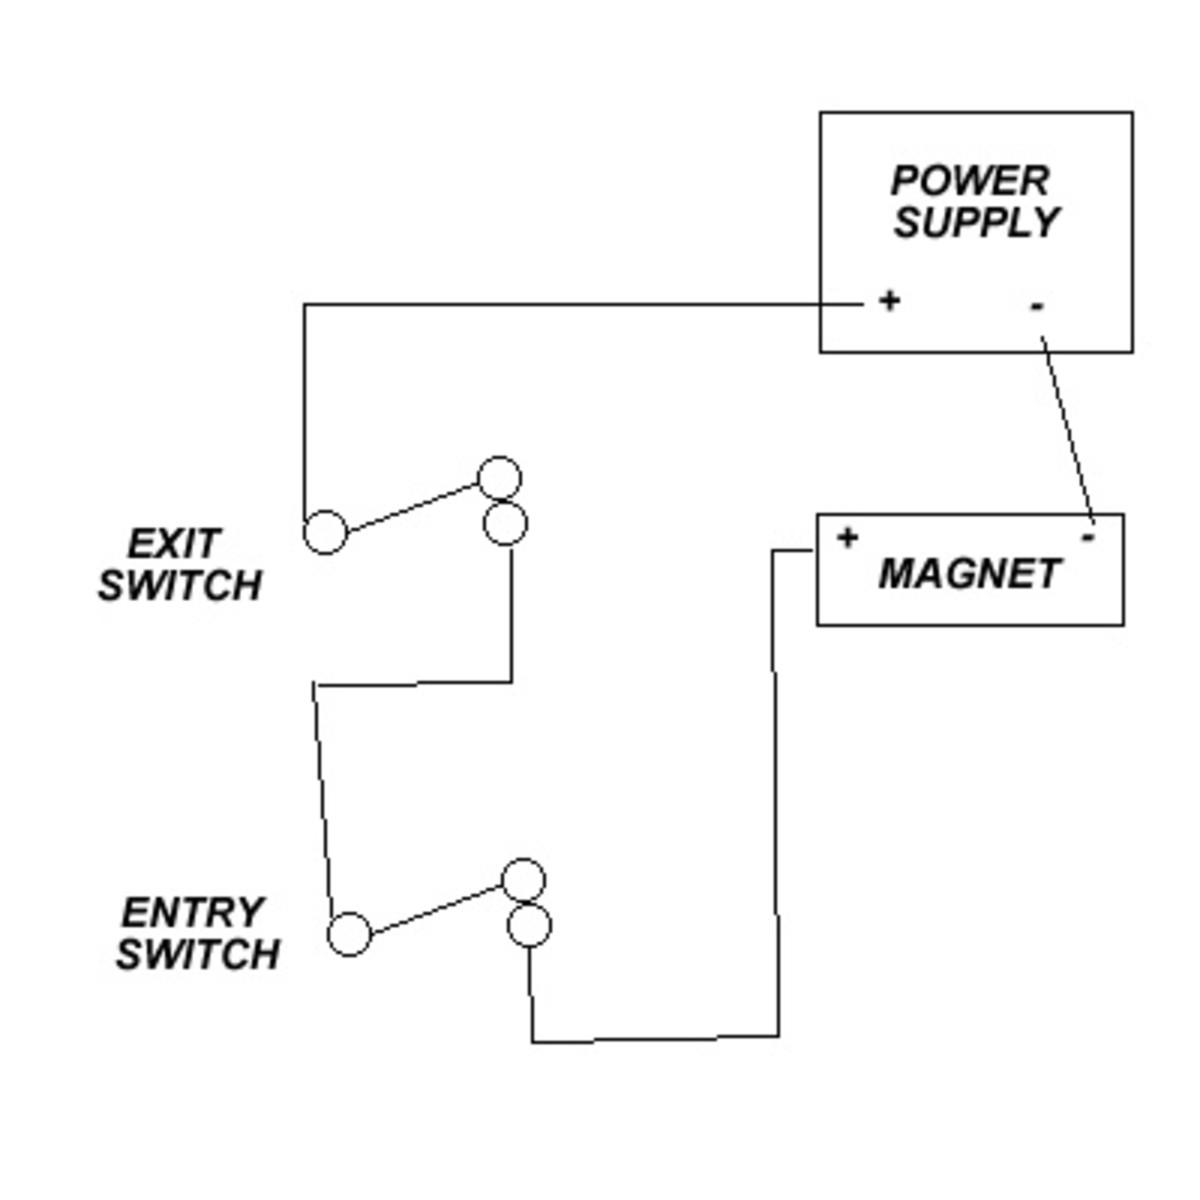 Basic Magnetic Door Lock System HubPages